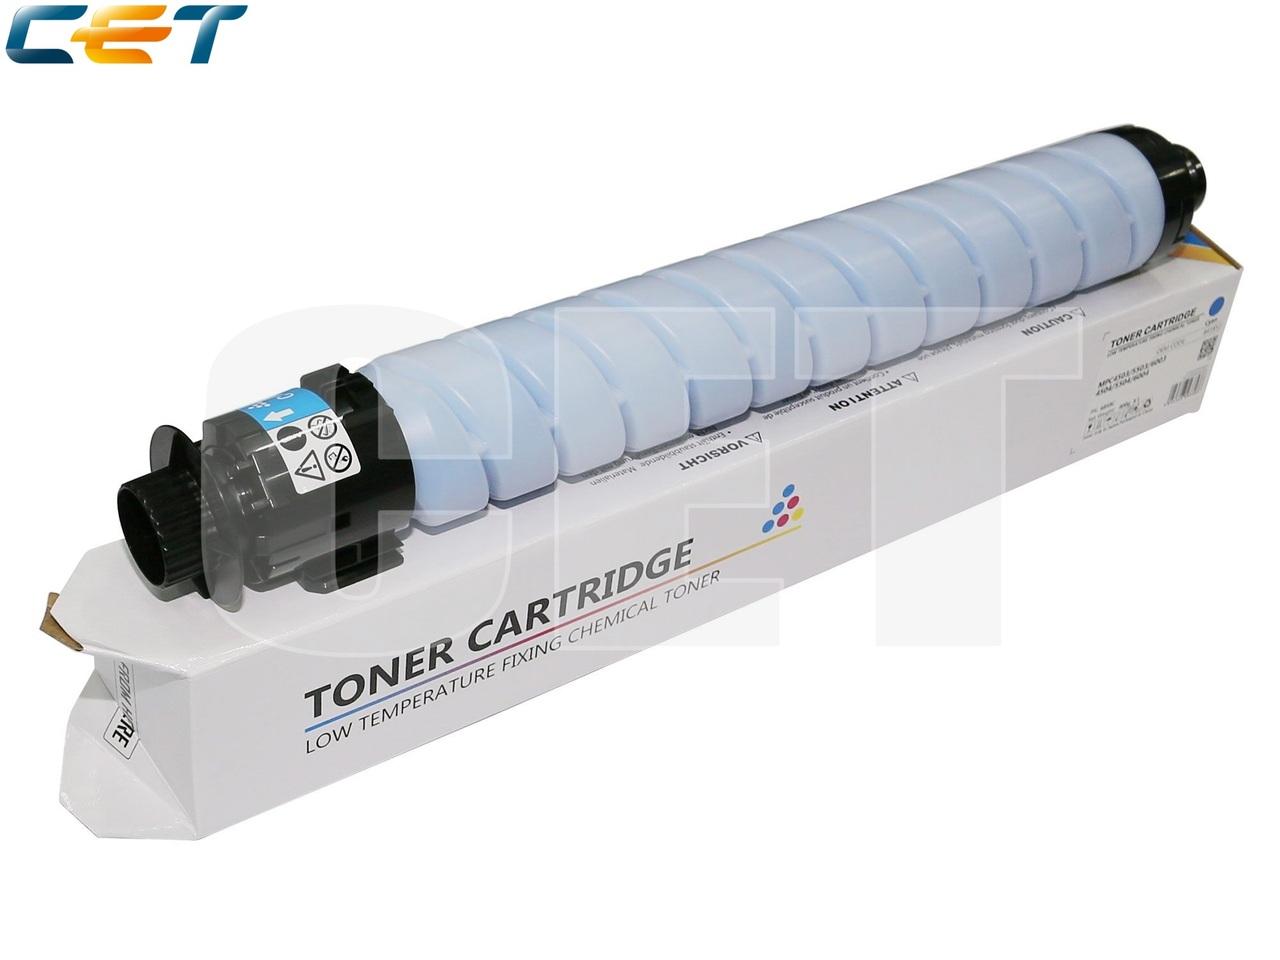 Тонер-картридж (CPP, HT8) 841856 для RICOH AficioMPC4503/5503/6003 (CET) Cyan, (WW), 400г, 22500 стр.,CET6858C